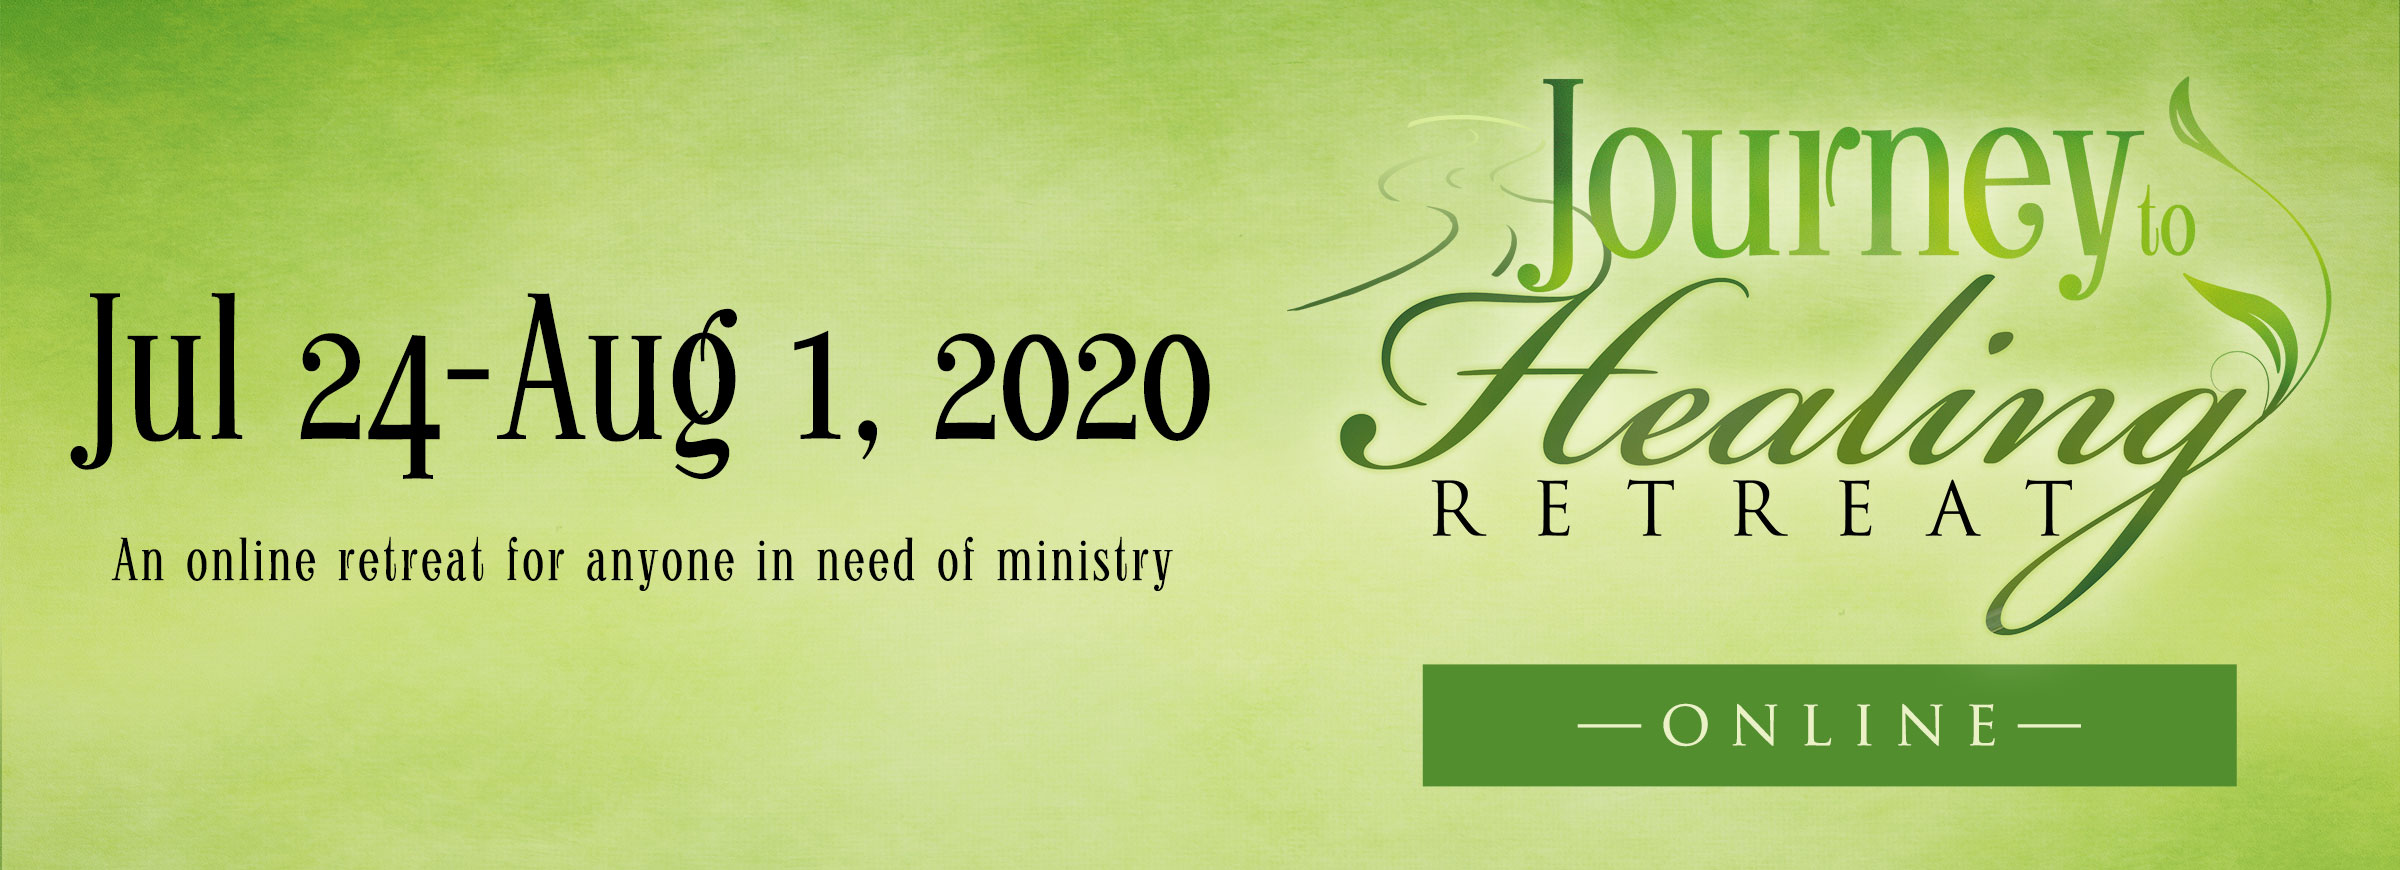 Journey to Healing Retreat Online July 2020